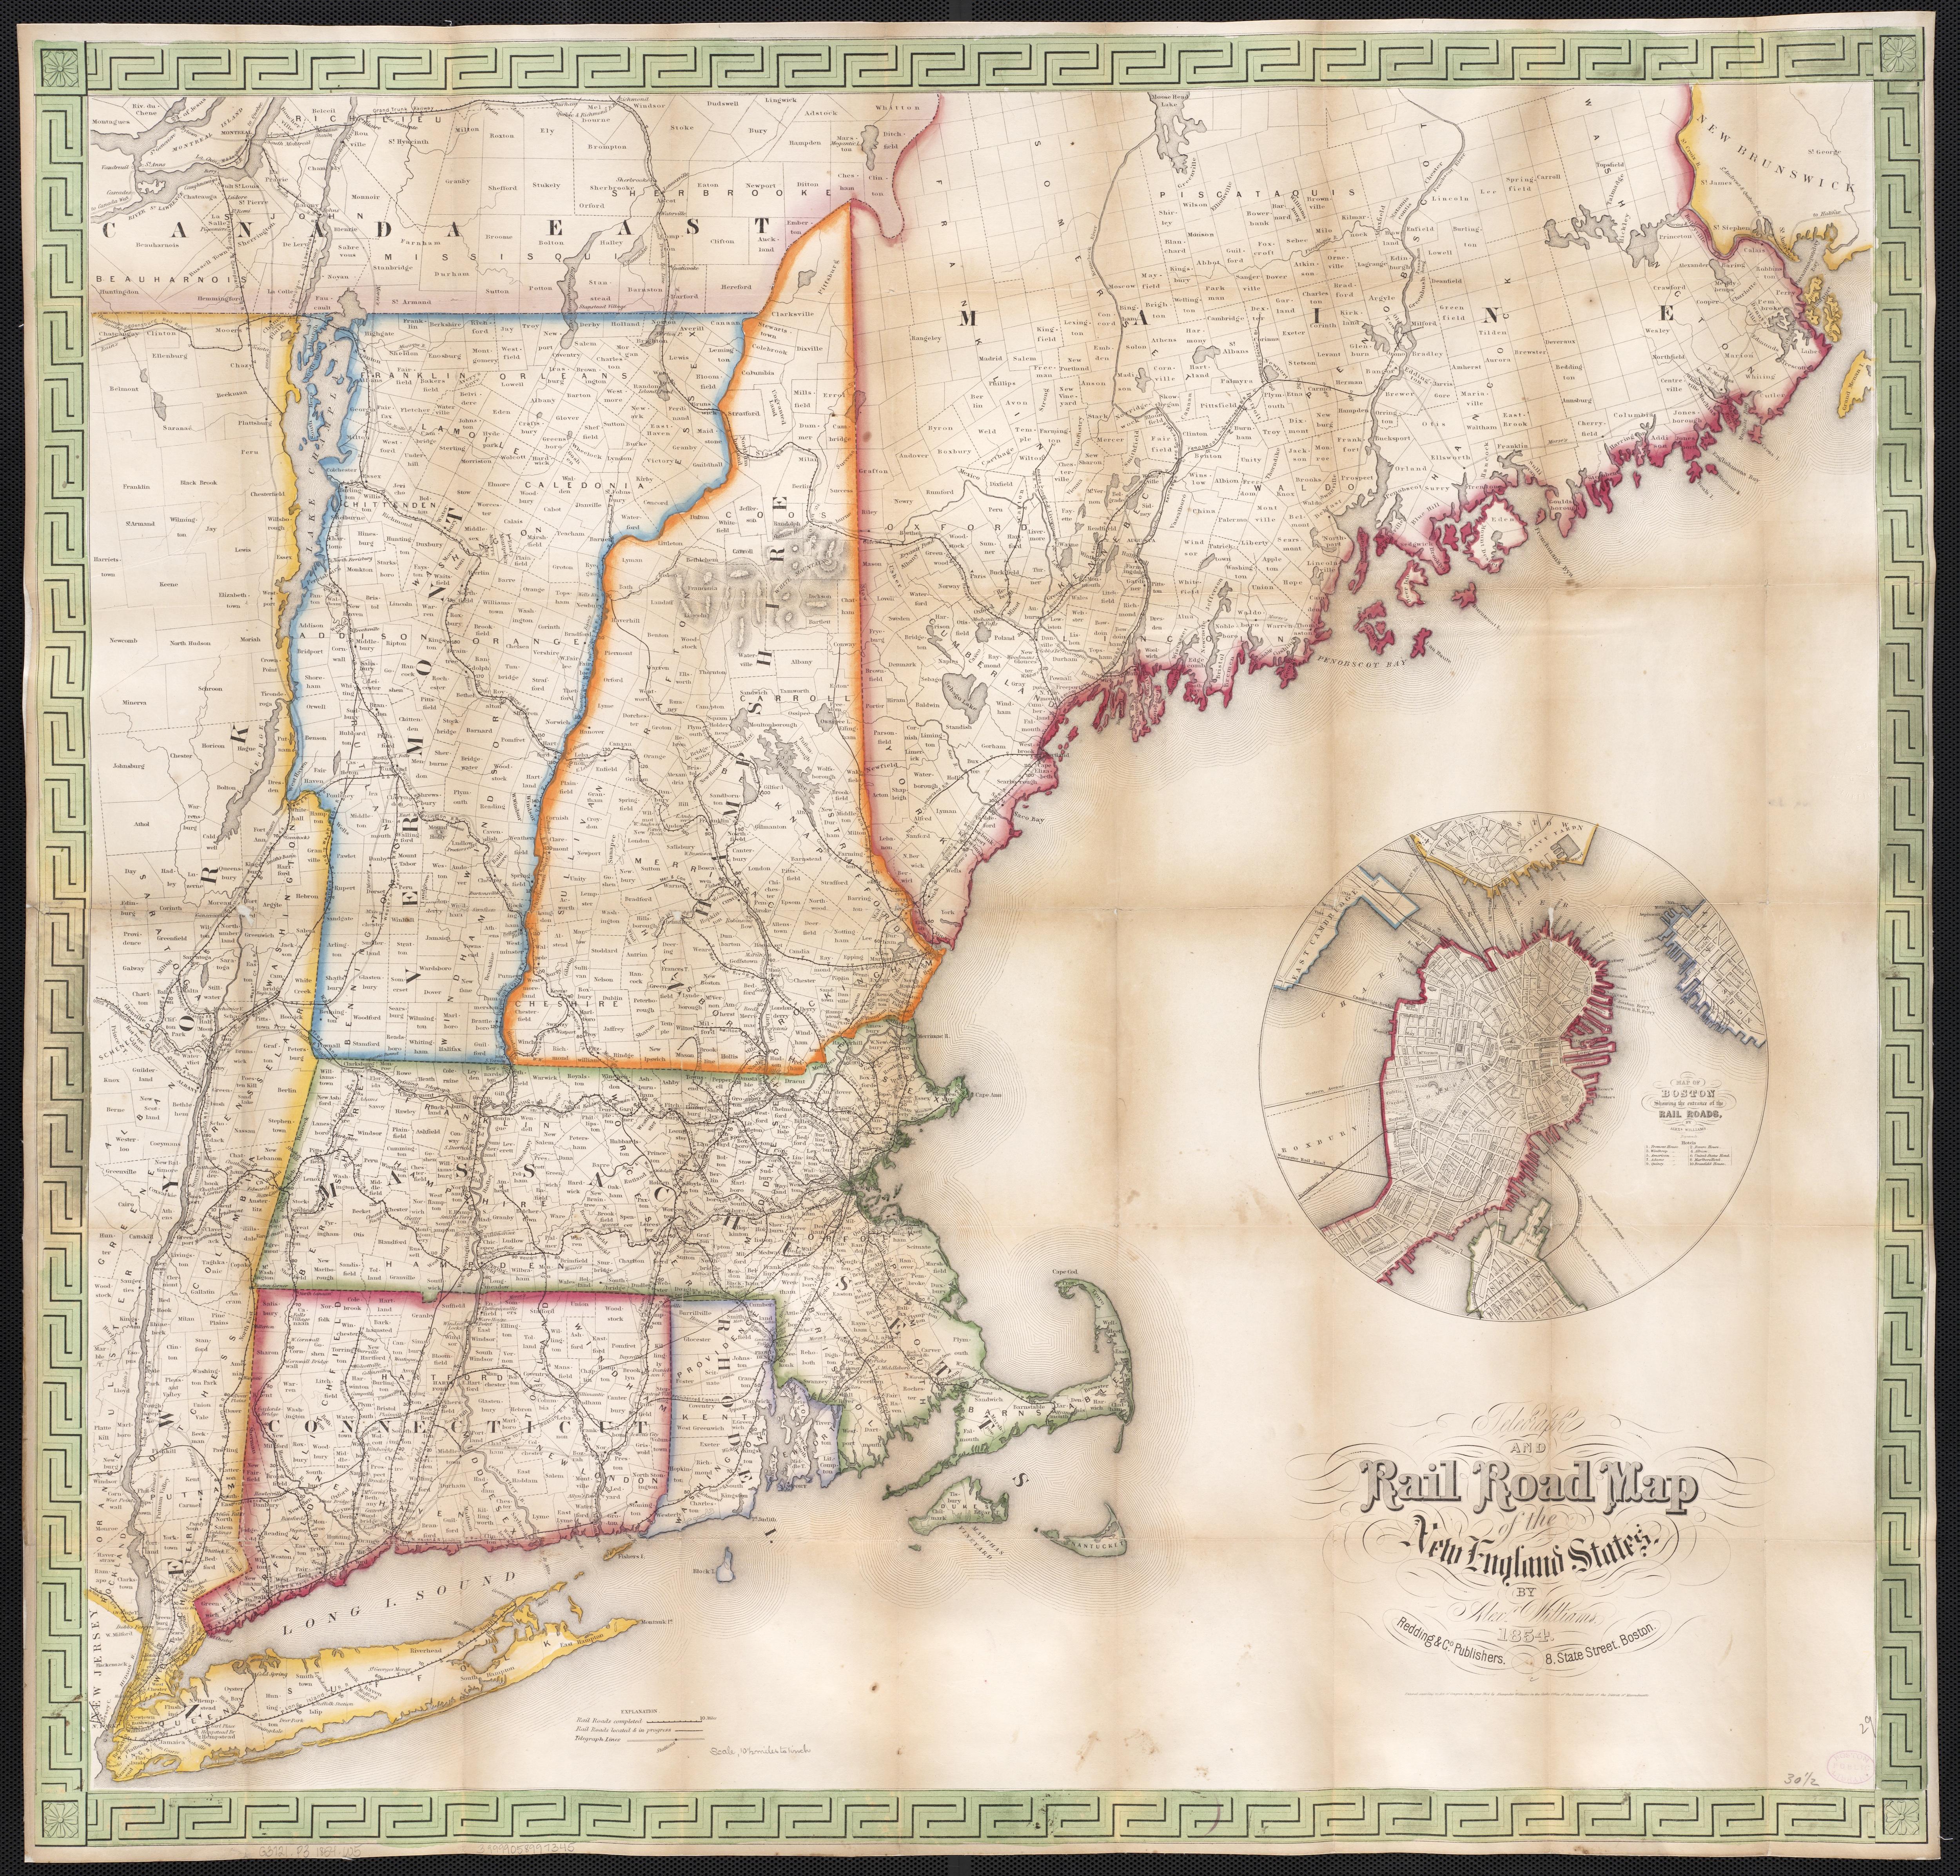 1854 Railroad Telegraph Map